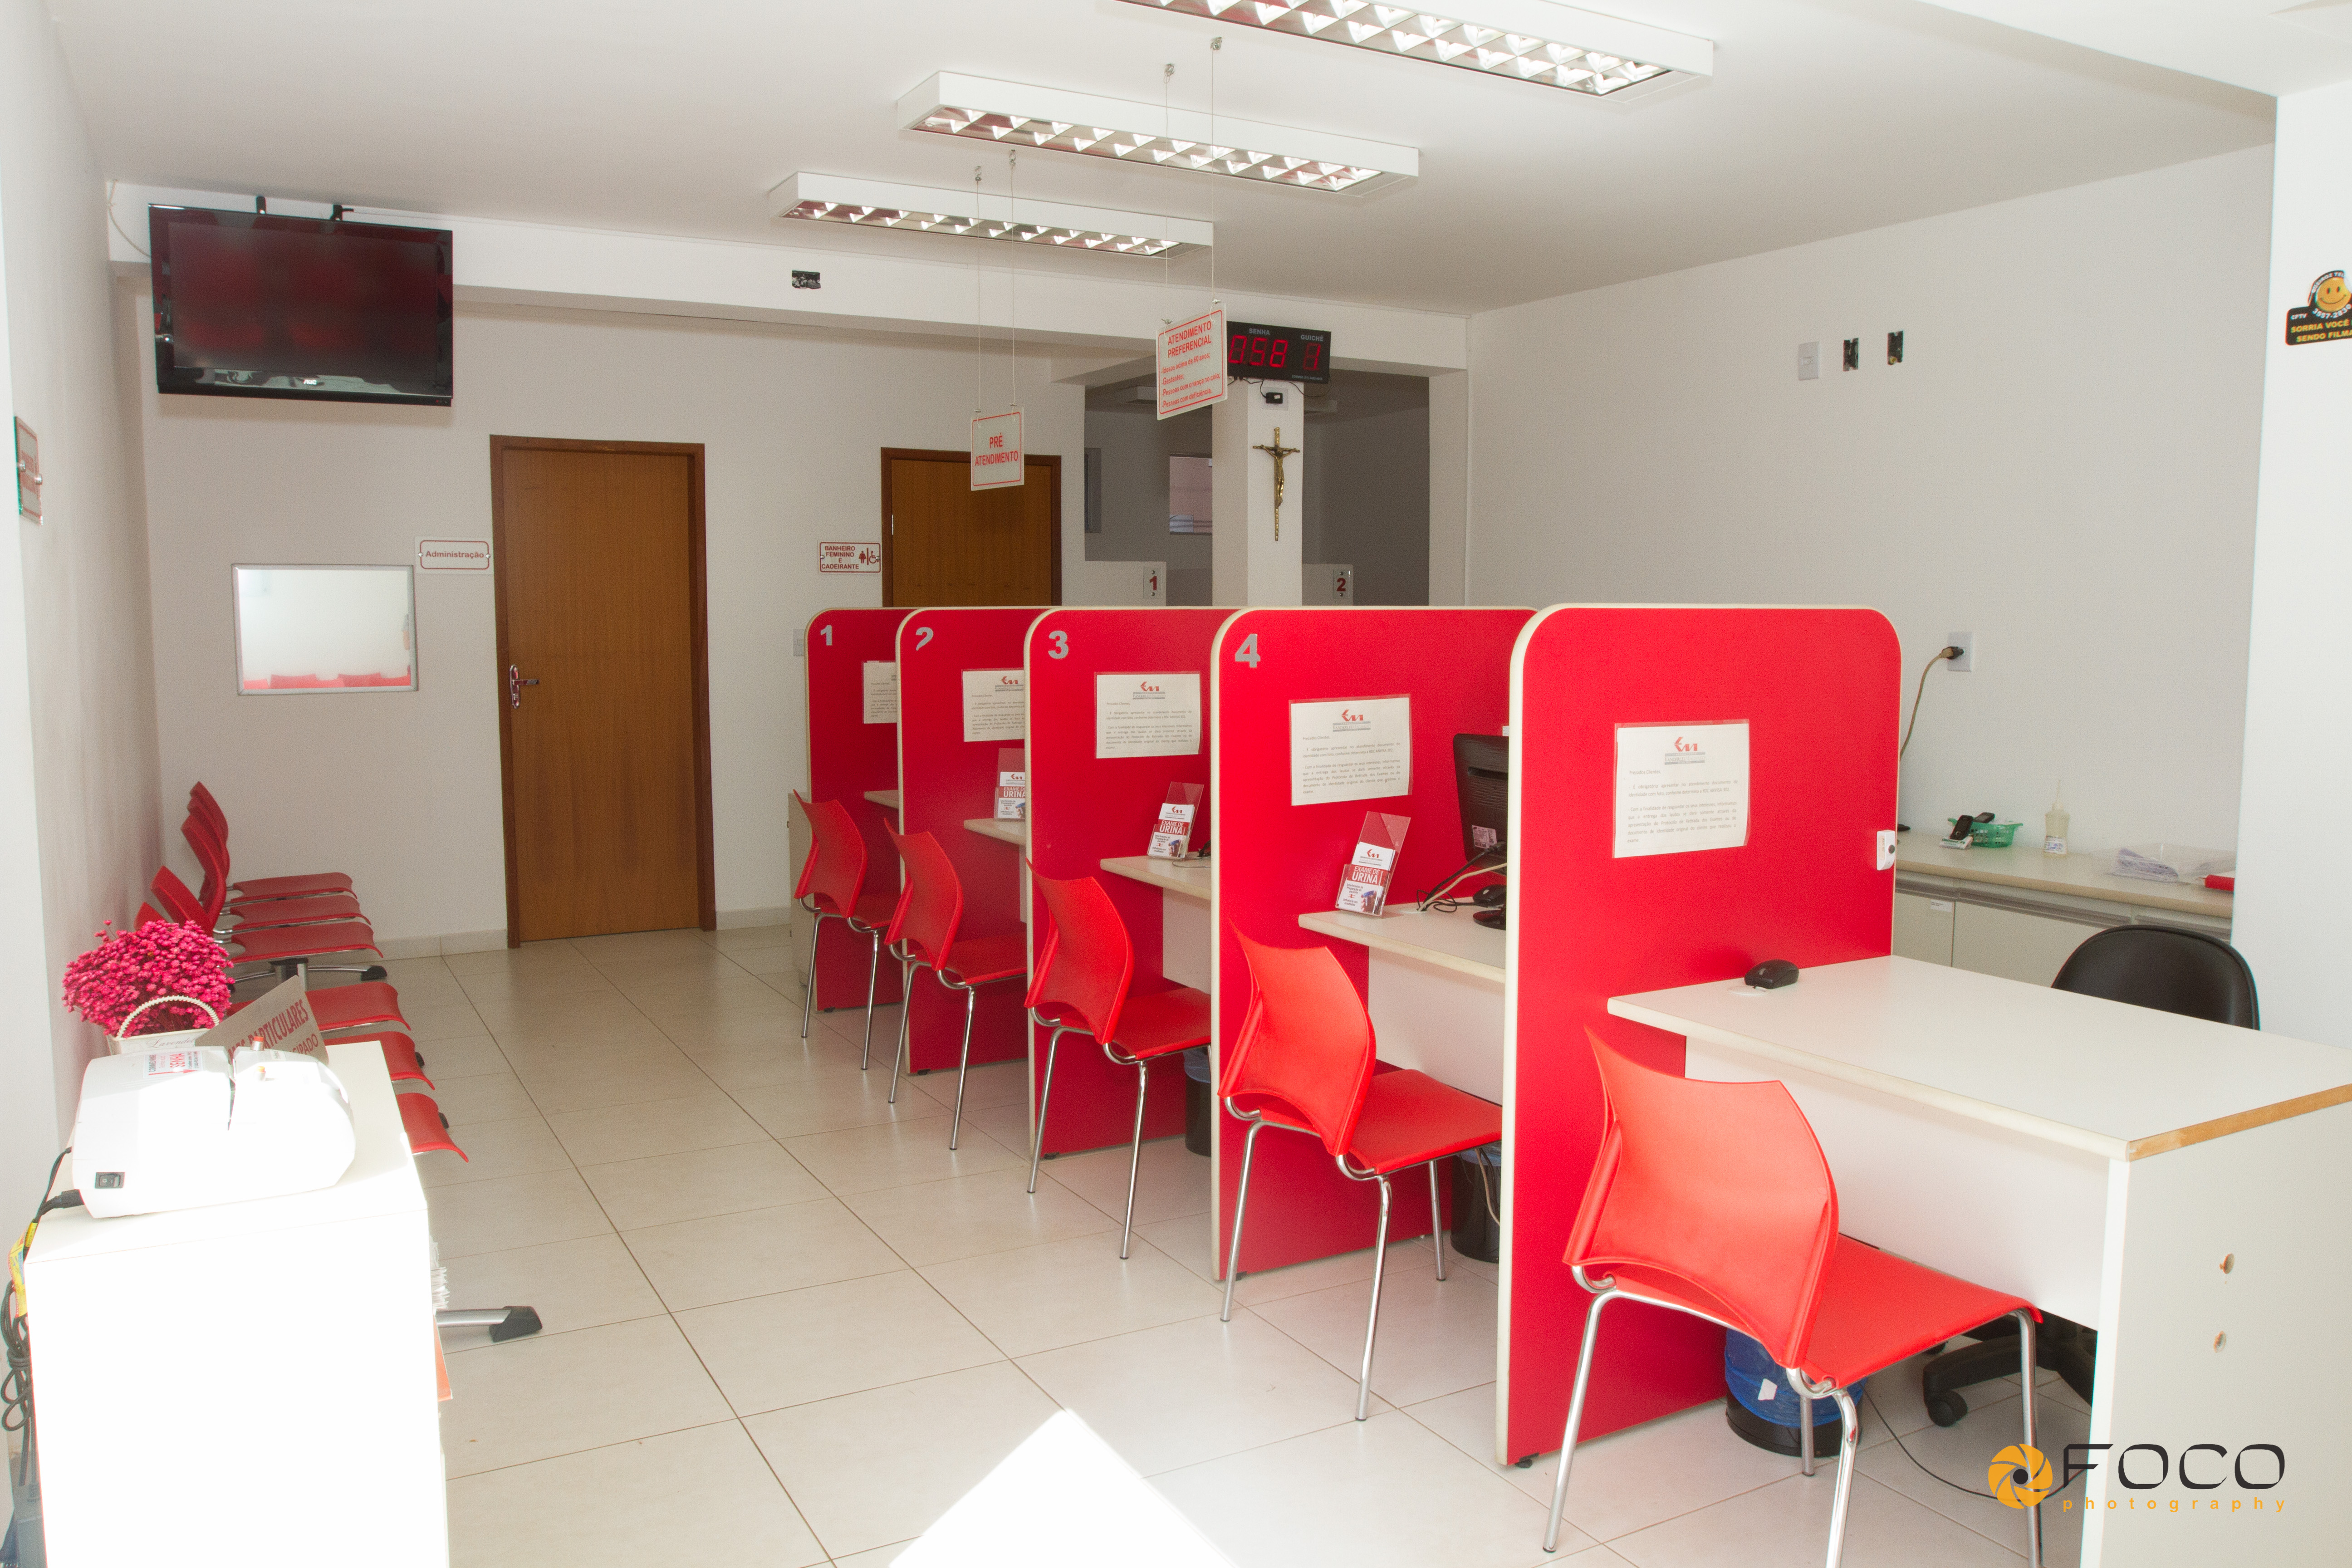 Laboratório Vanderlei Machado